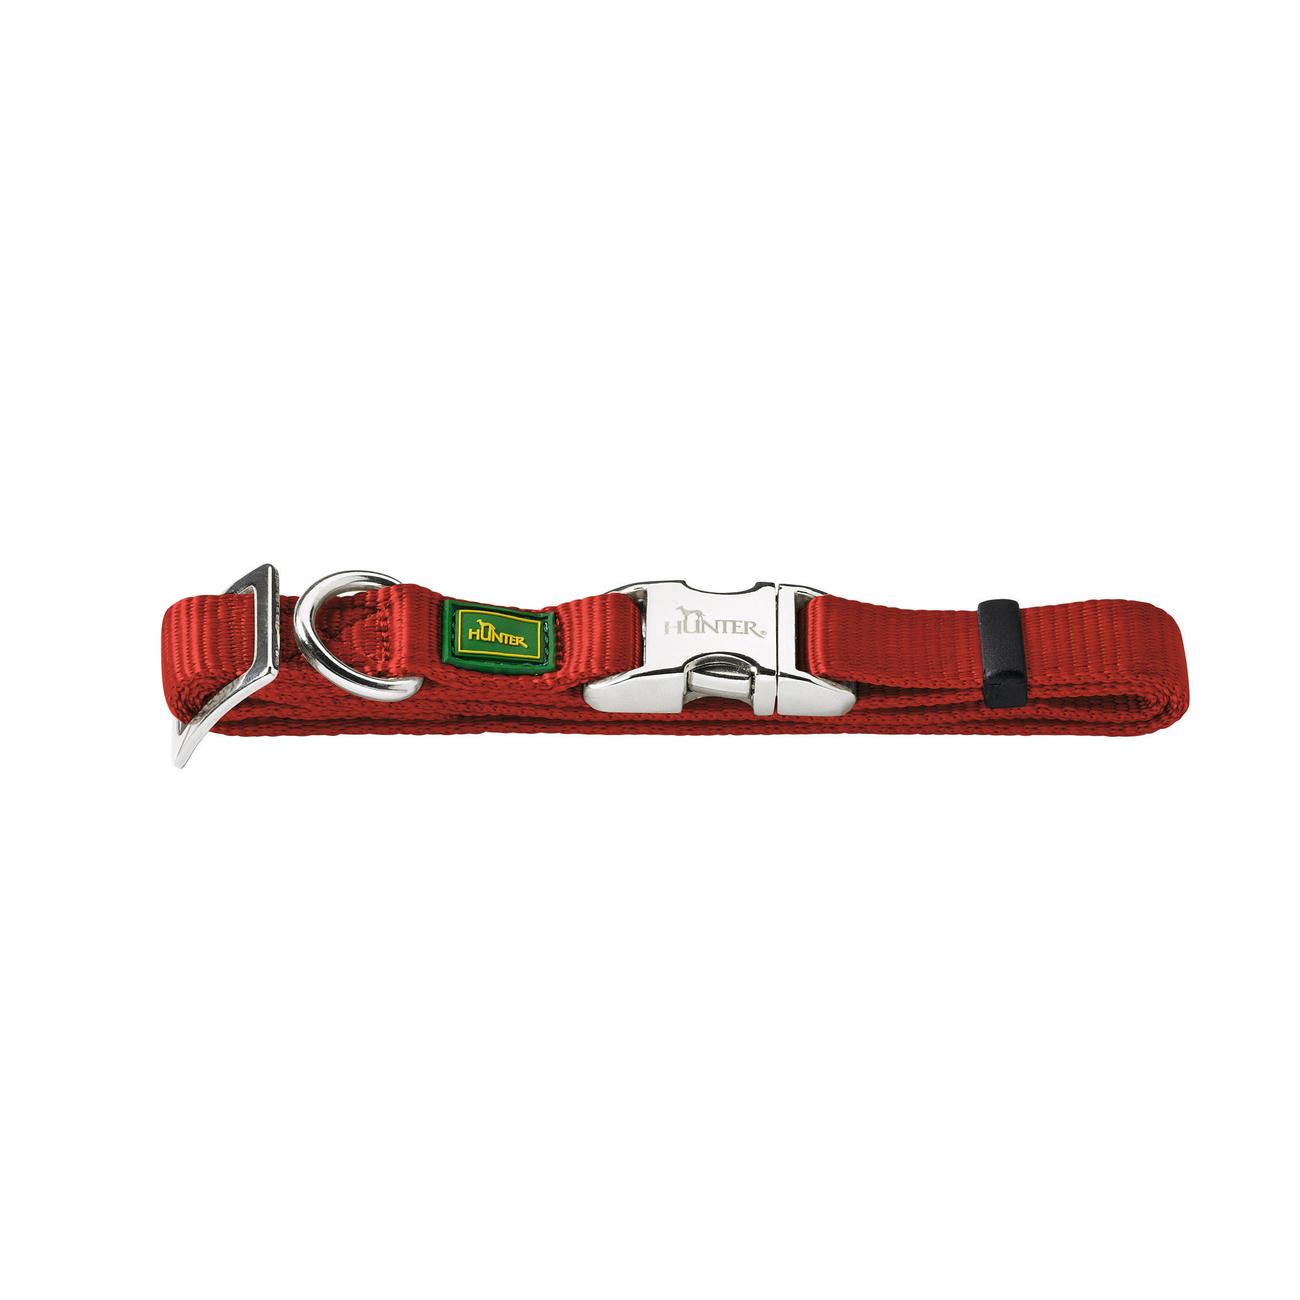 Hunter Halsband Vario Basic Alu Strong Verschluss 46668, Bild 9